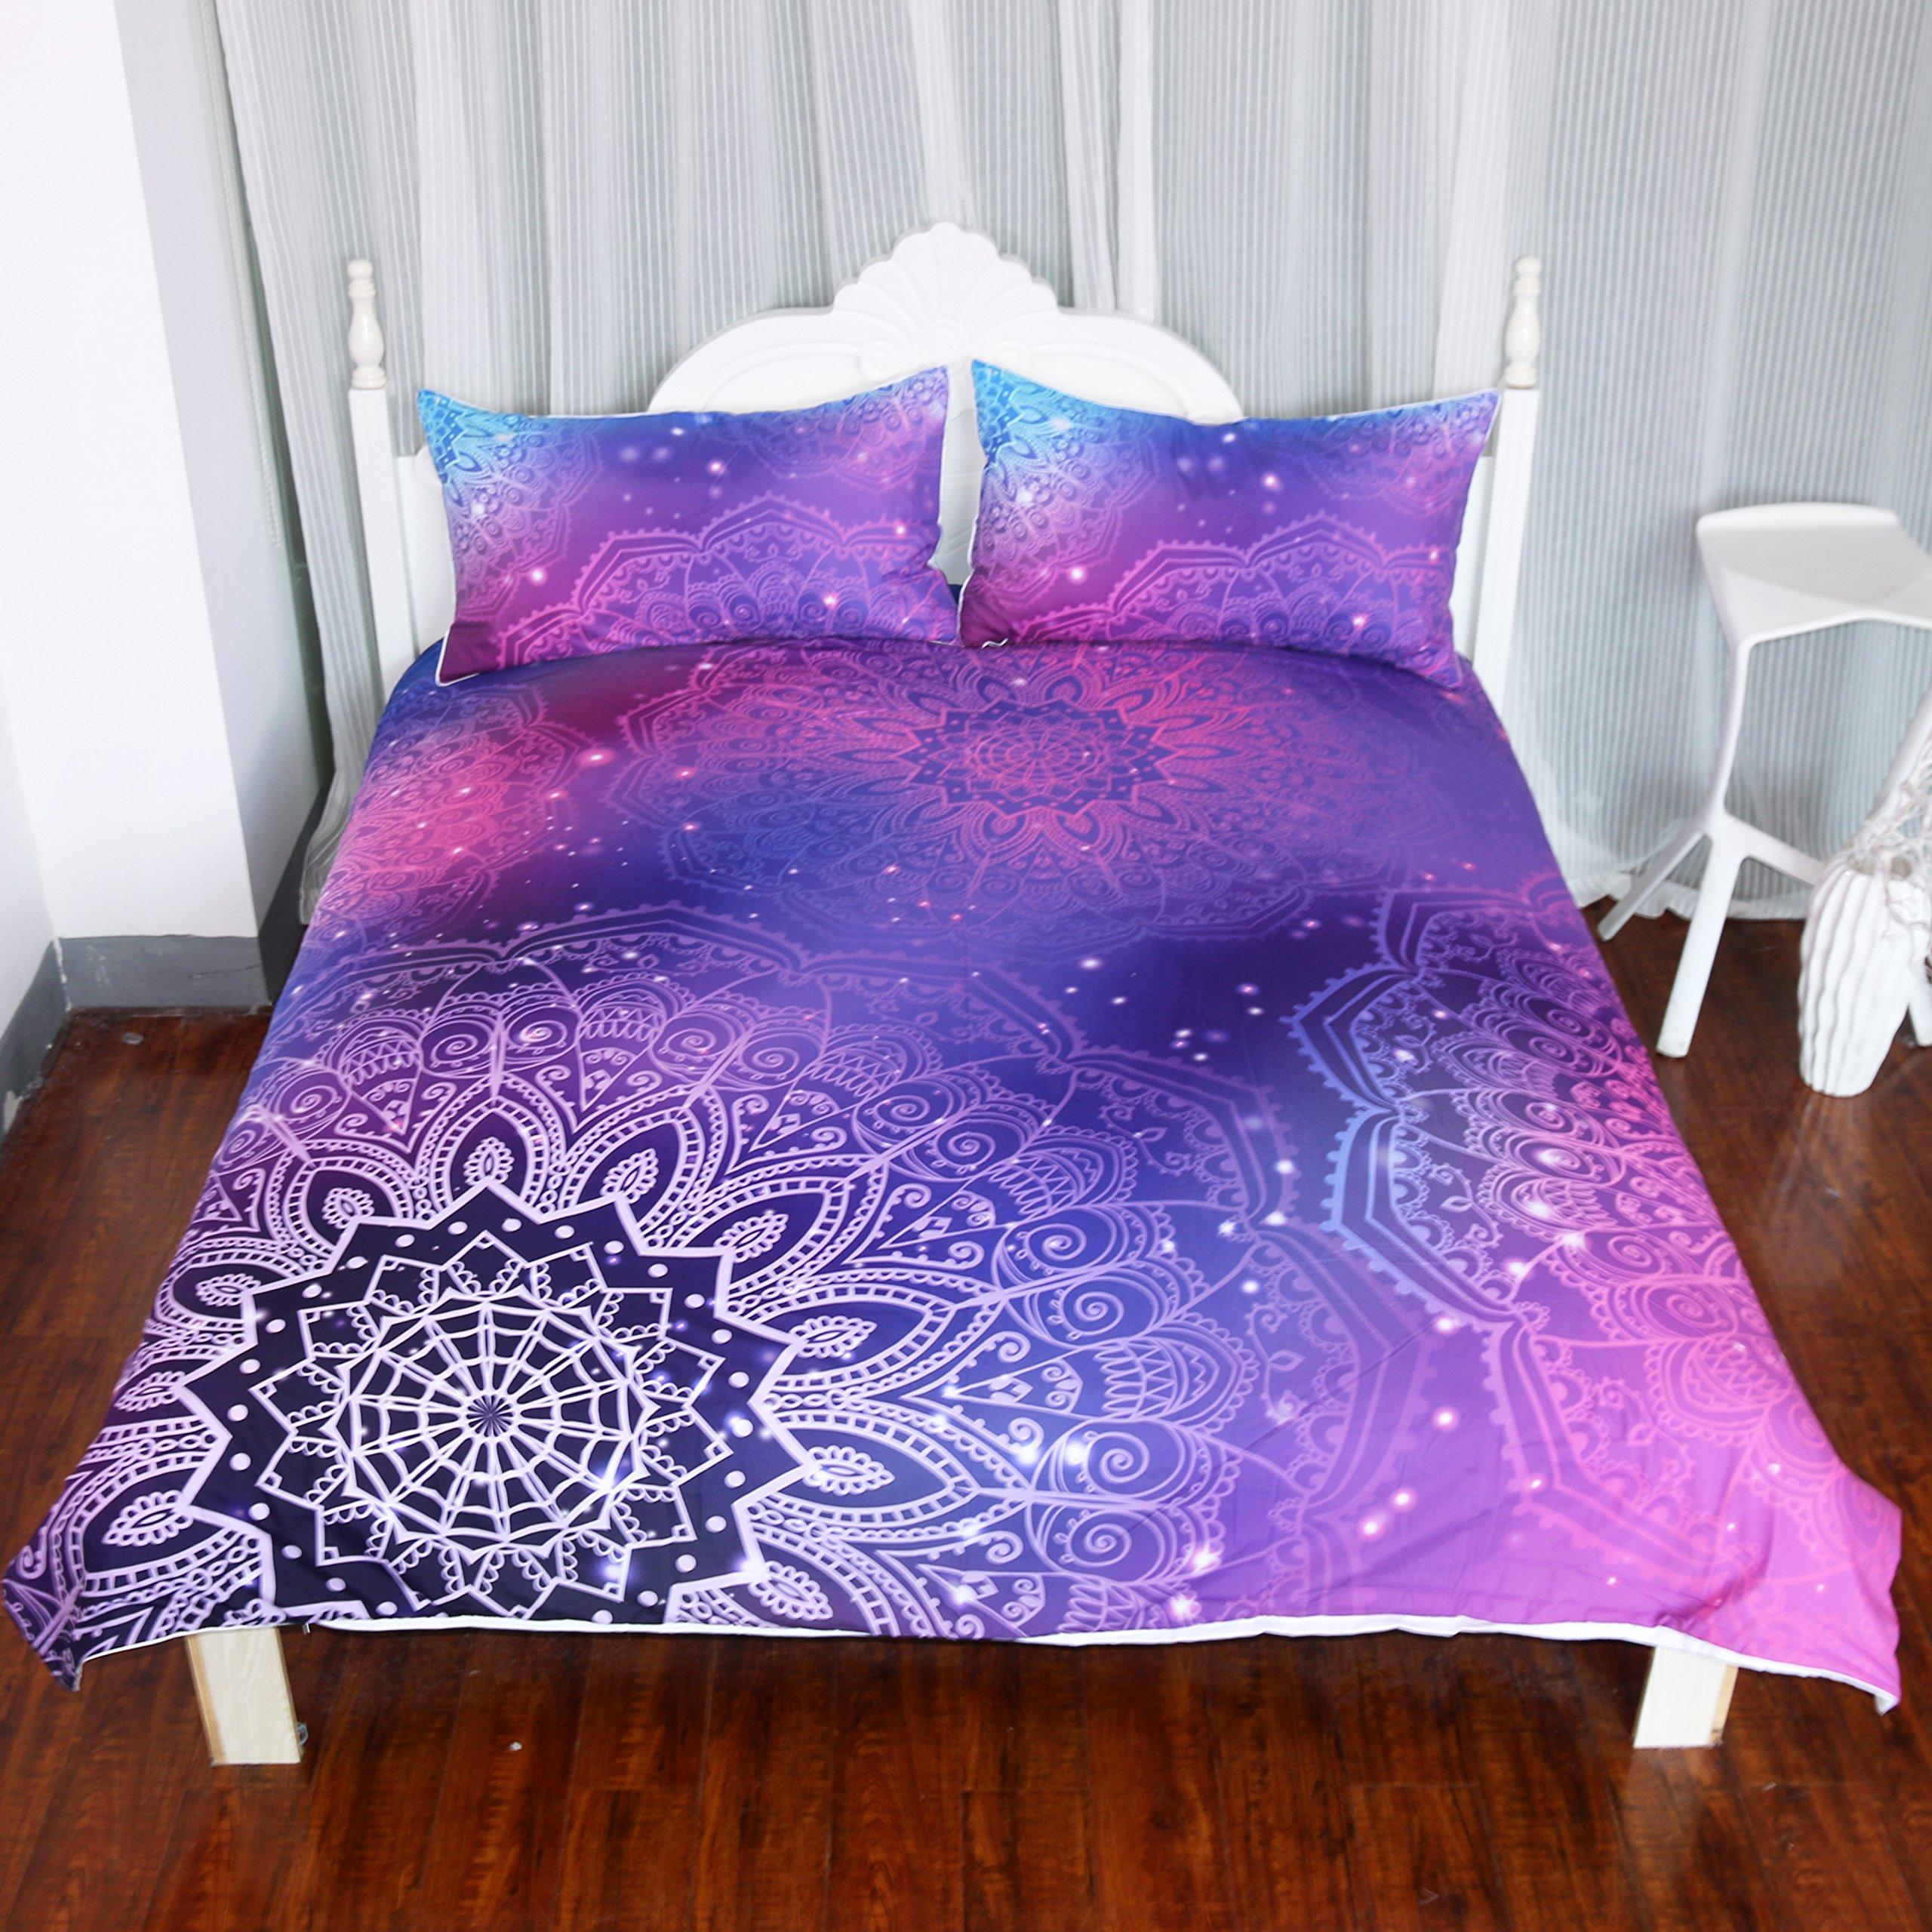 ARIGHTEX Iridescent Pink Purple Blue Mandala Duvet Cover 3 Pieces Boho Bedding Set Girly Duvet Cover (Queen)